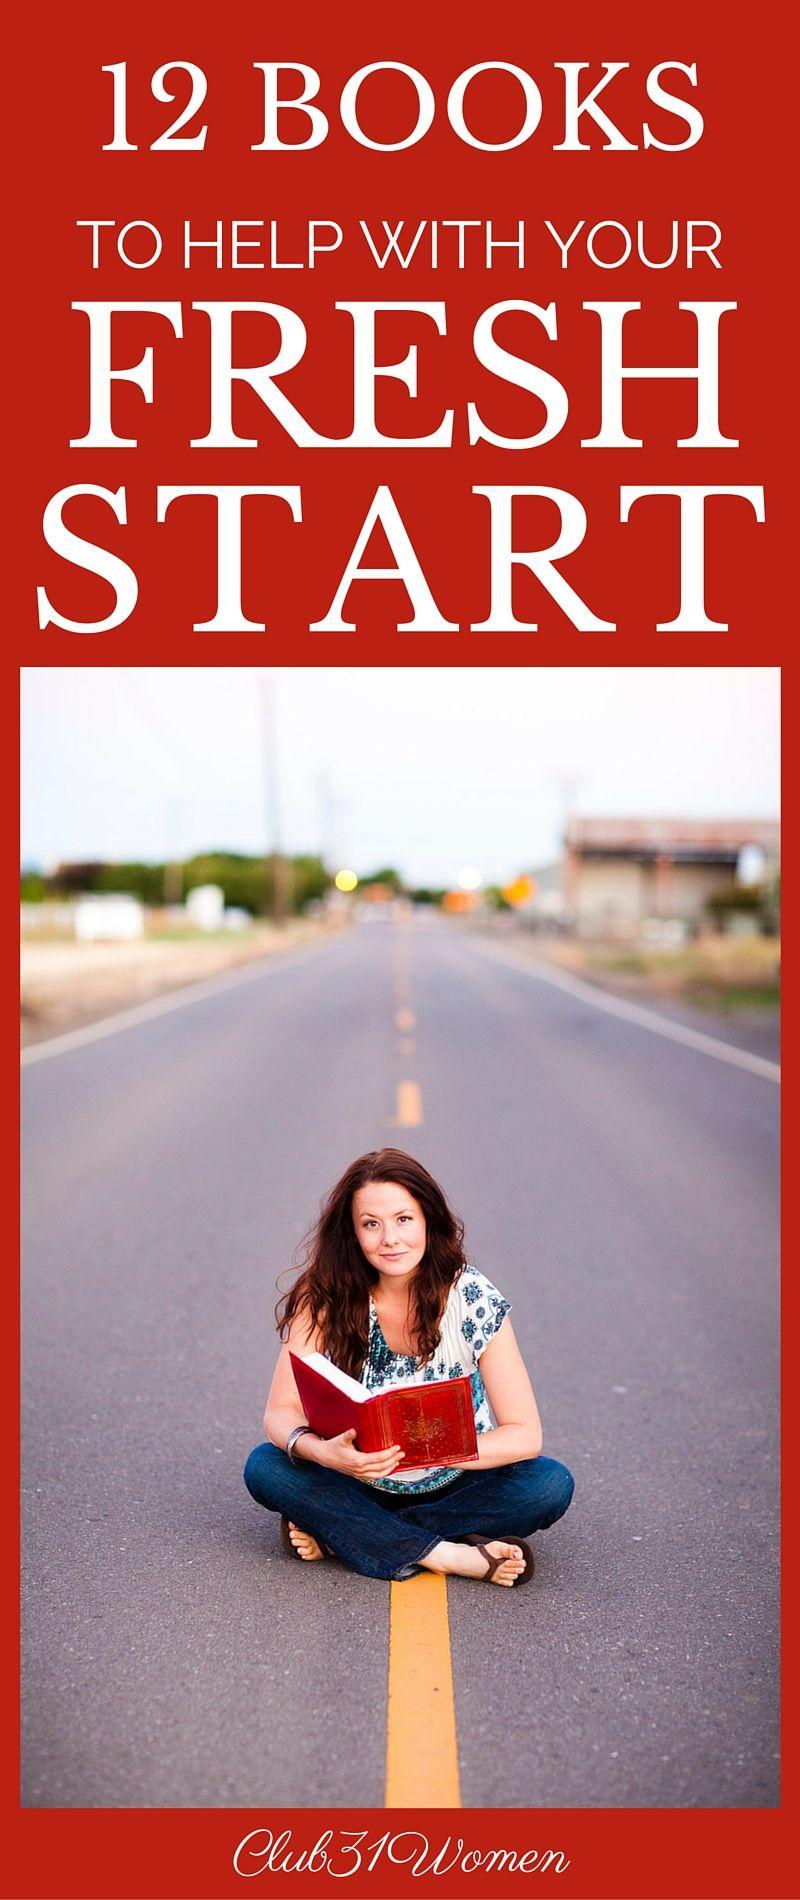 Nadia Lim's Fresh Start Cookbook